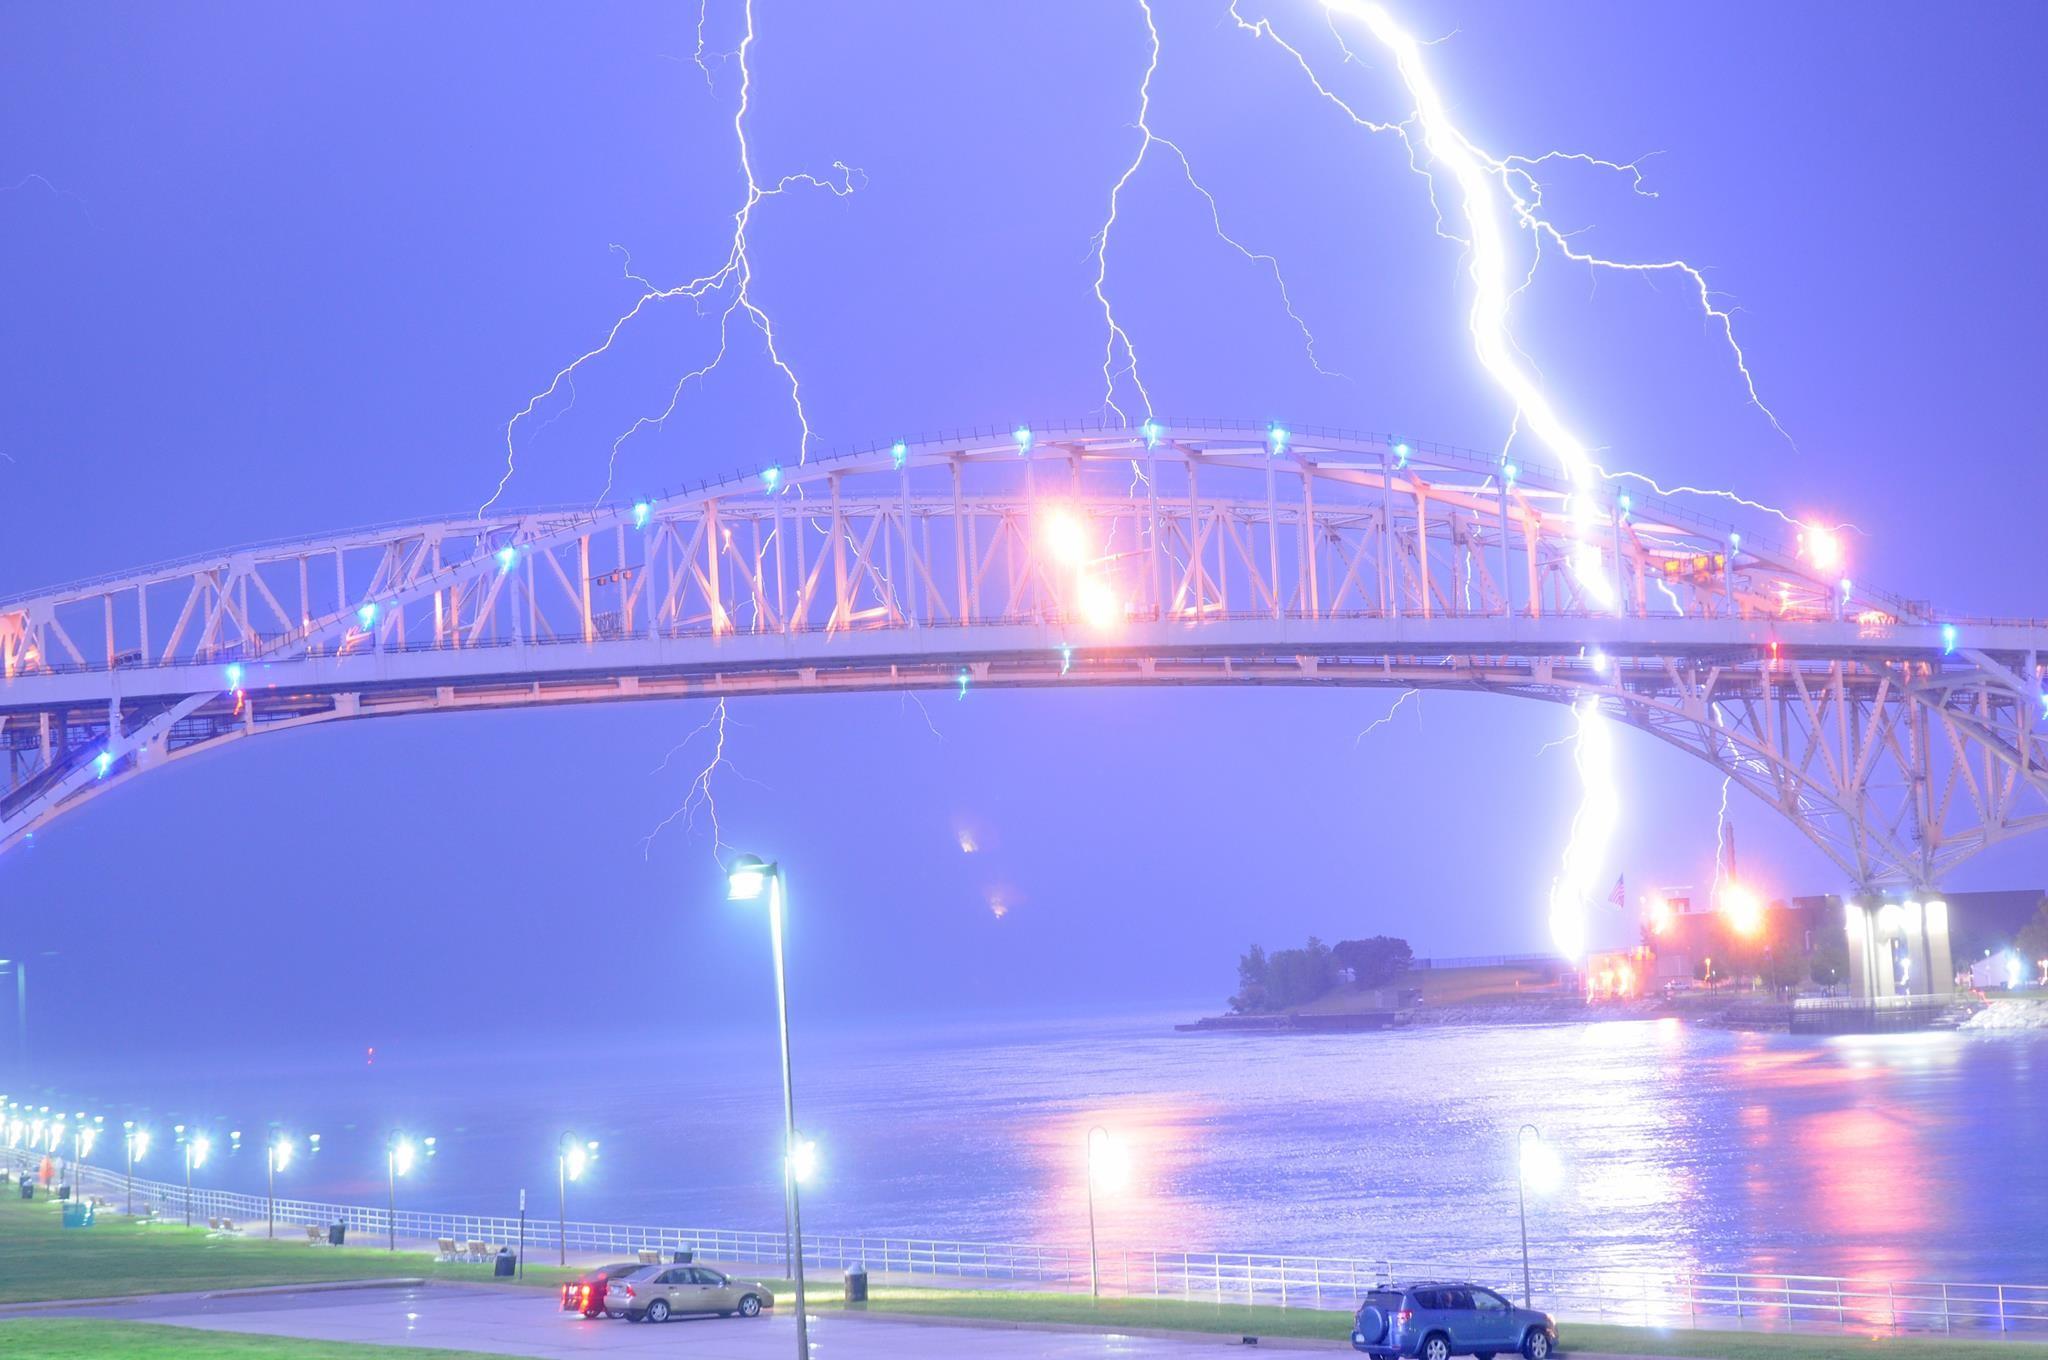 Res: 2048x1360, Great shot of lightning striking the Bluewater bridge in Port Huron/Sarnia  ...